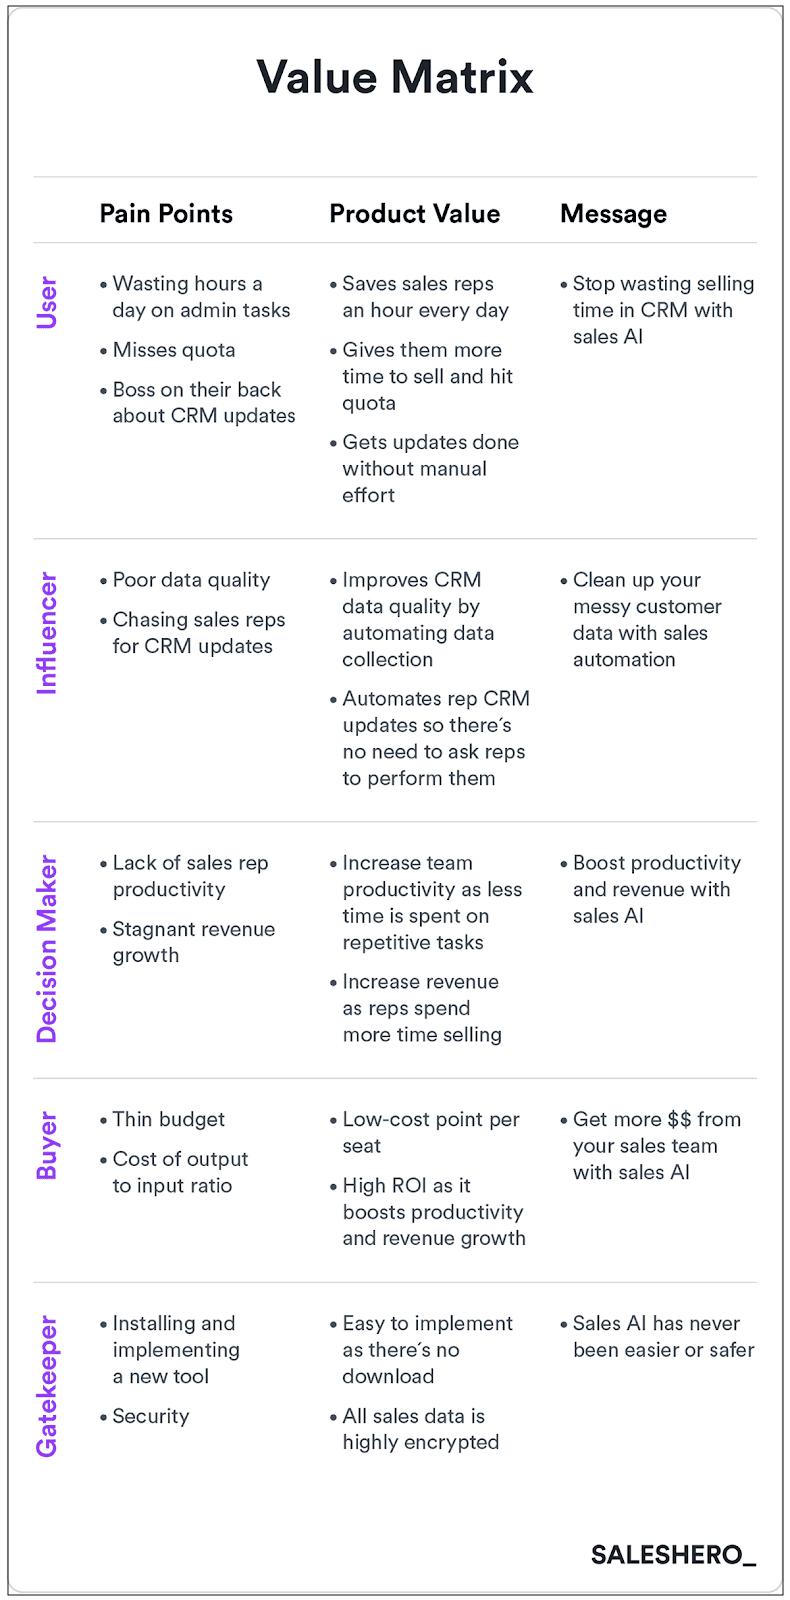 Sales hero value matrix